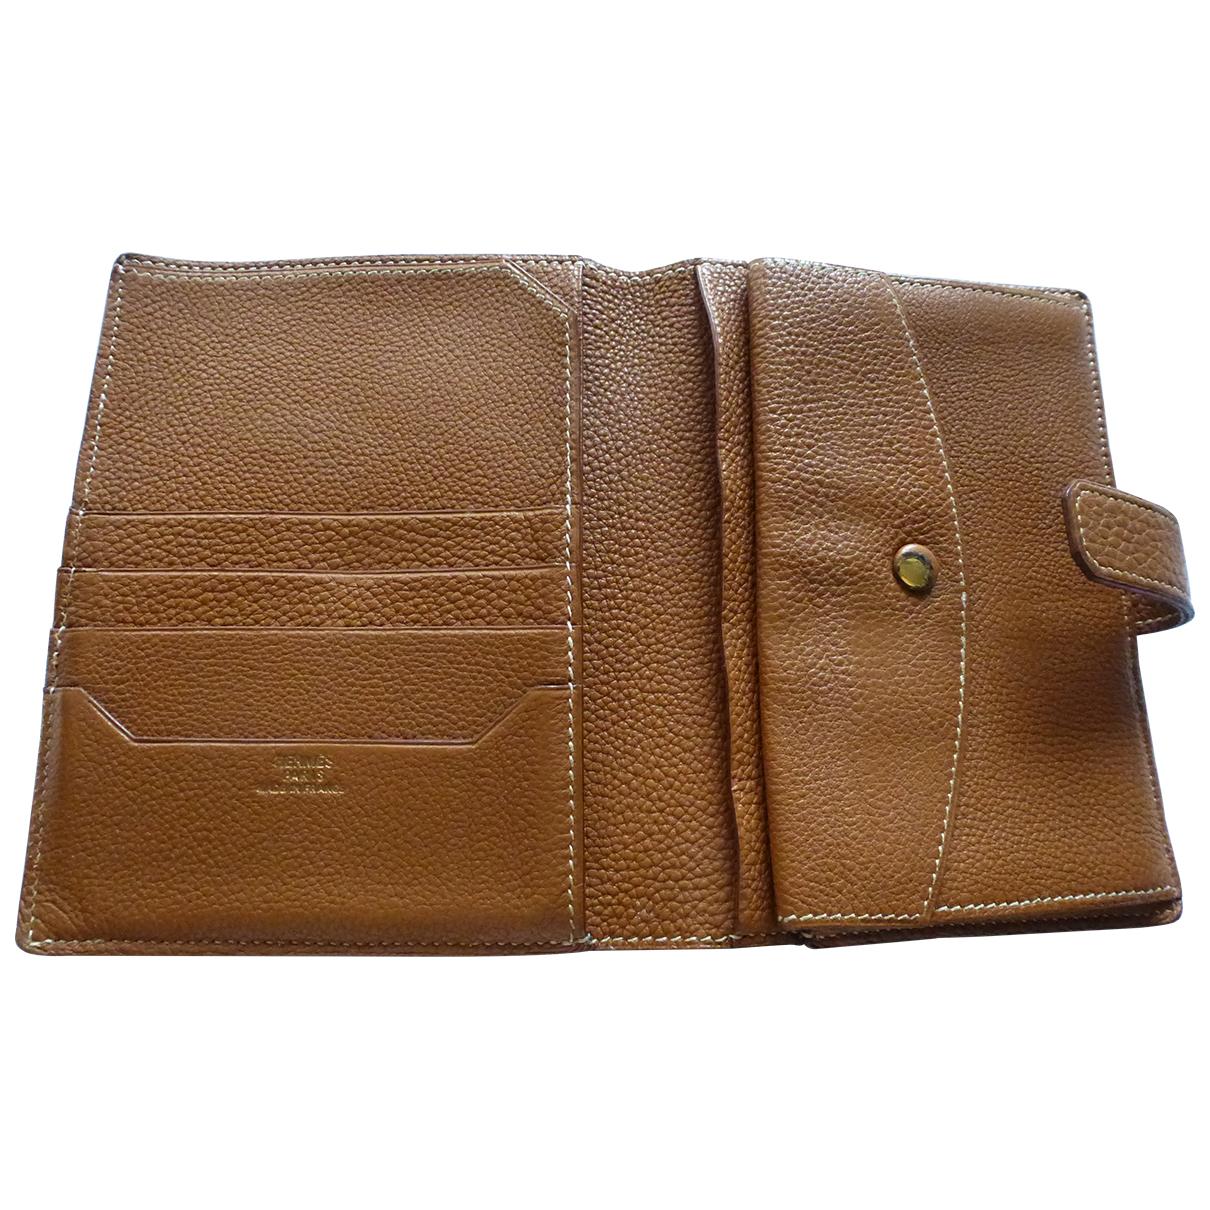 Hermès \N Camel Leather wallet for Women \N